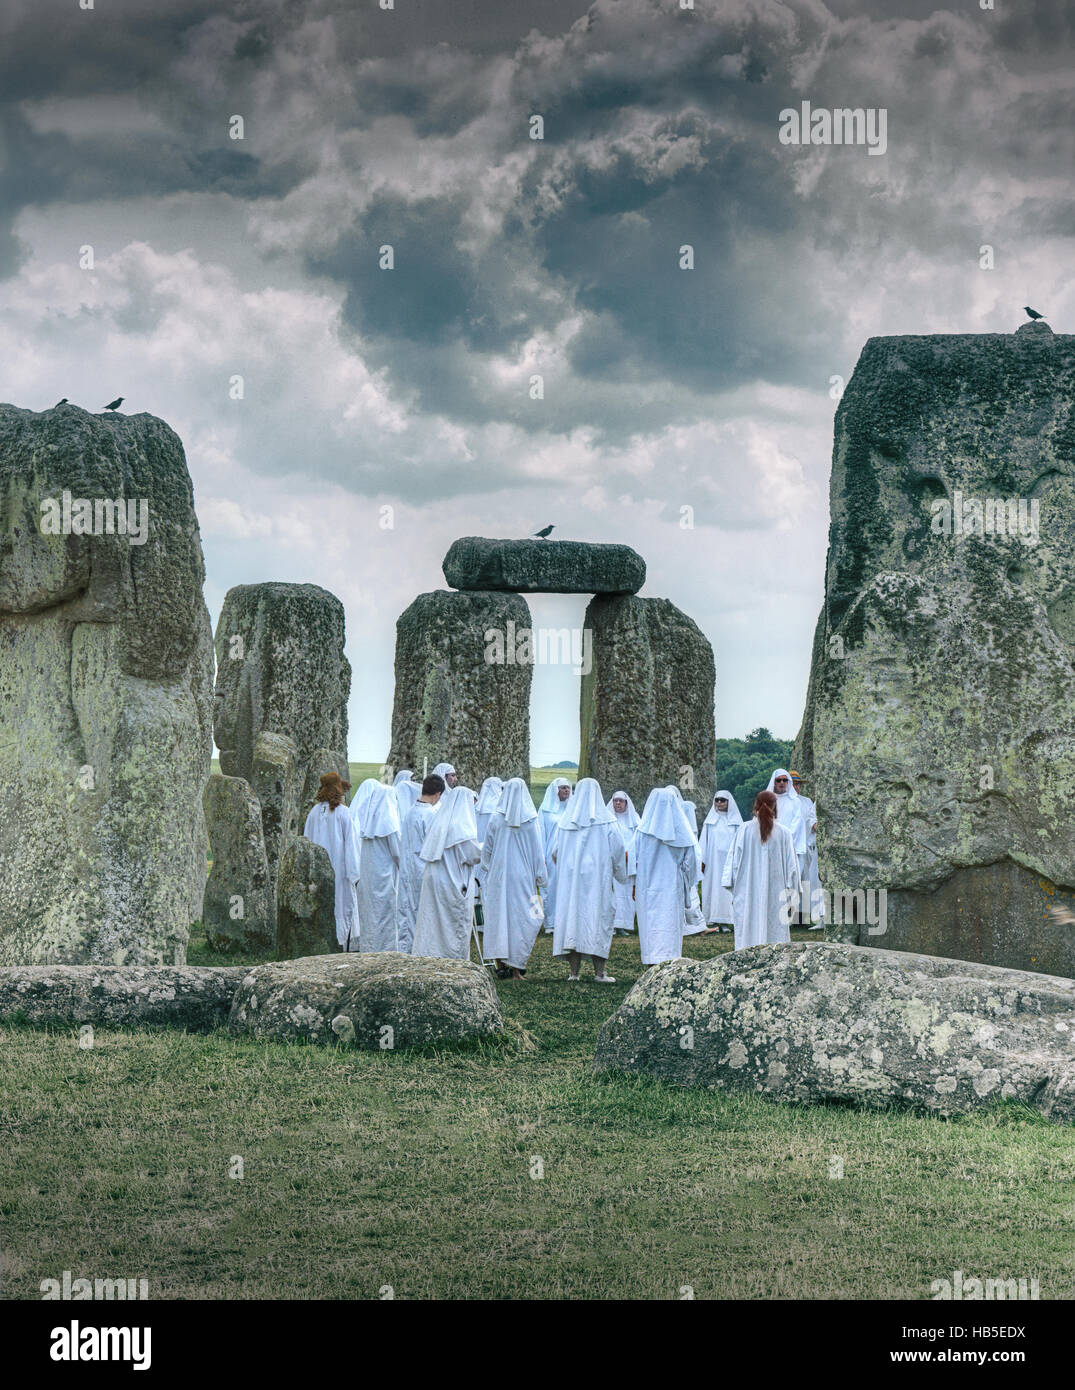 Solstice at Stonehenge. Druids. Pagan celebration. Pagan ritual. Stock Photo